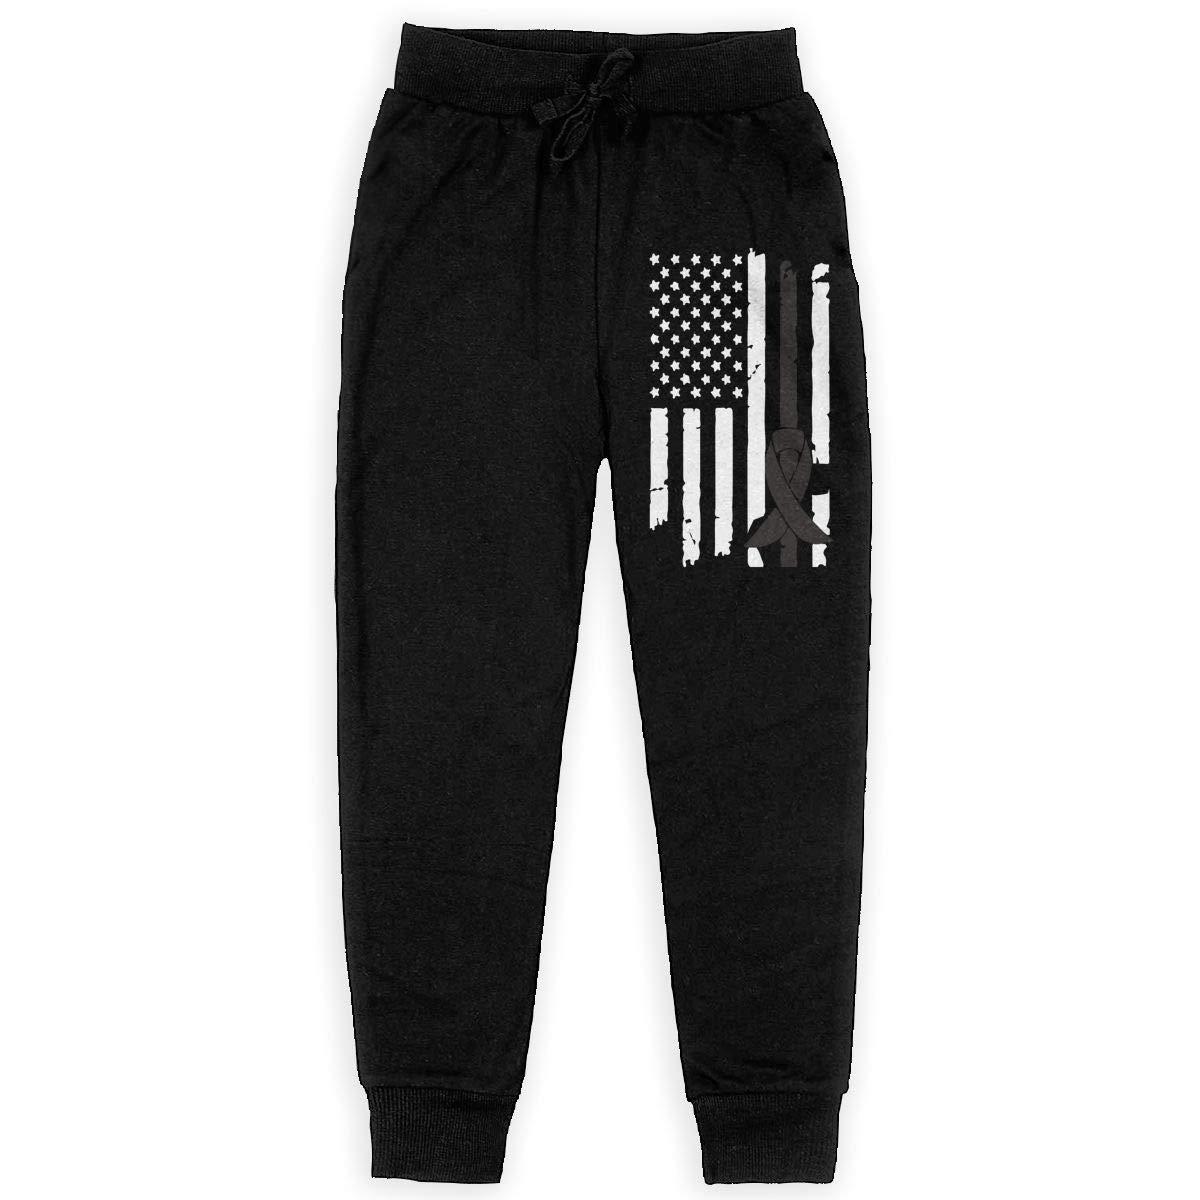 Boys Fleece Pants for Teenager Boys WYZVK22 Melanoma Awareness USA Flag-1 Soft//Cozy Sweatpants